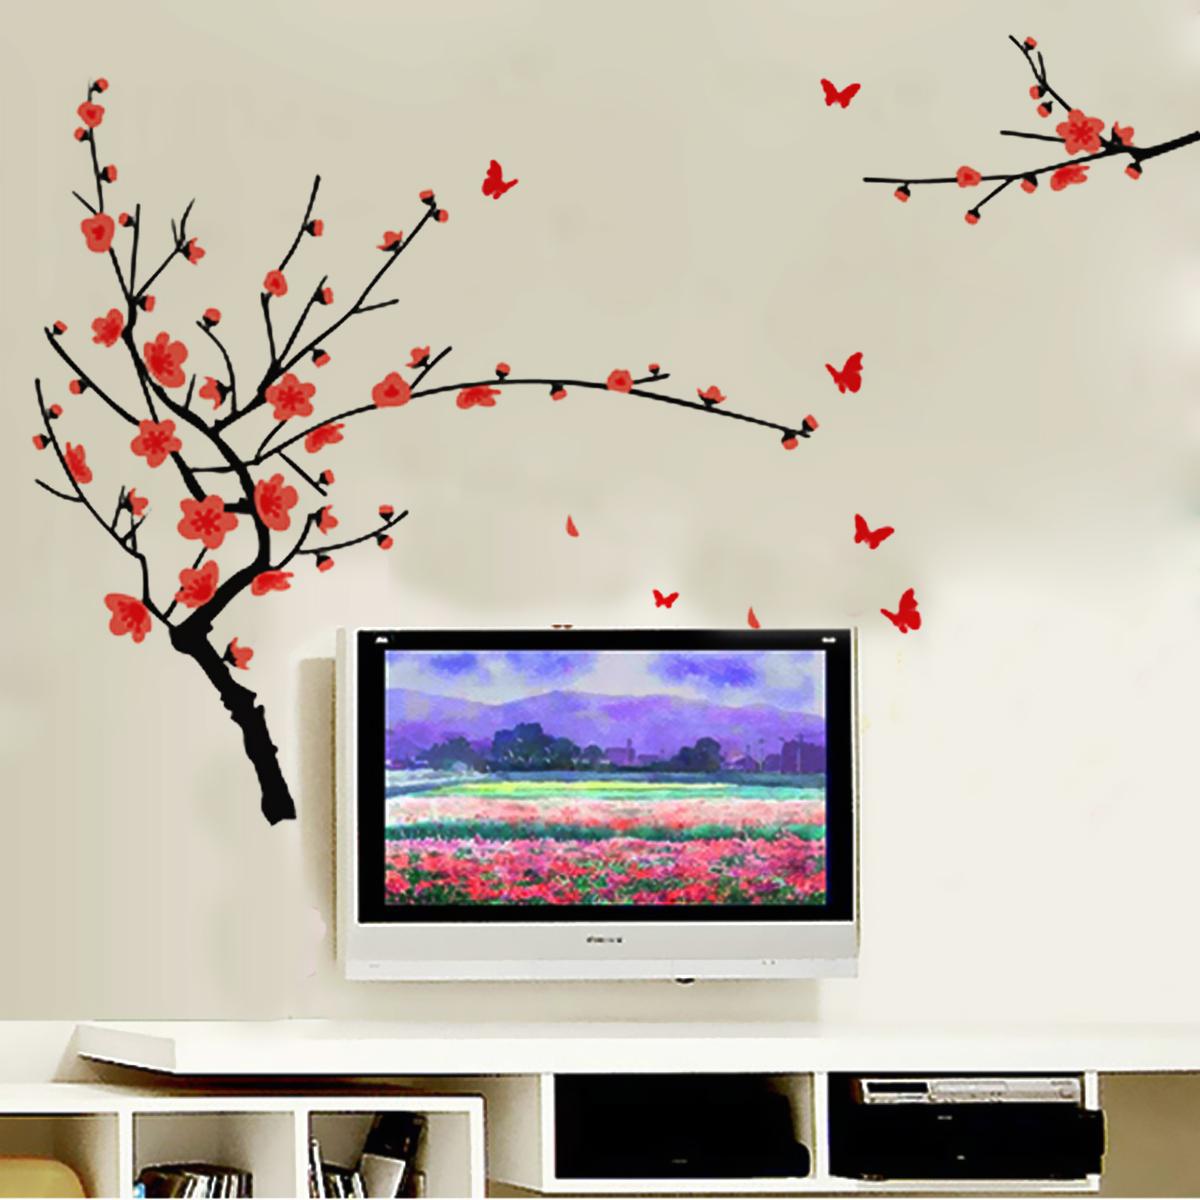 Mural words art vinyl wall sticker home bedroom decal decor diy ebay